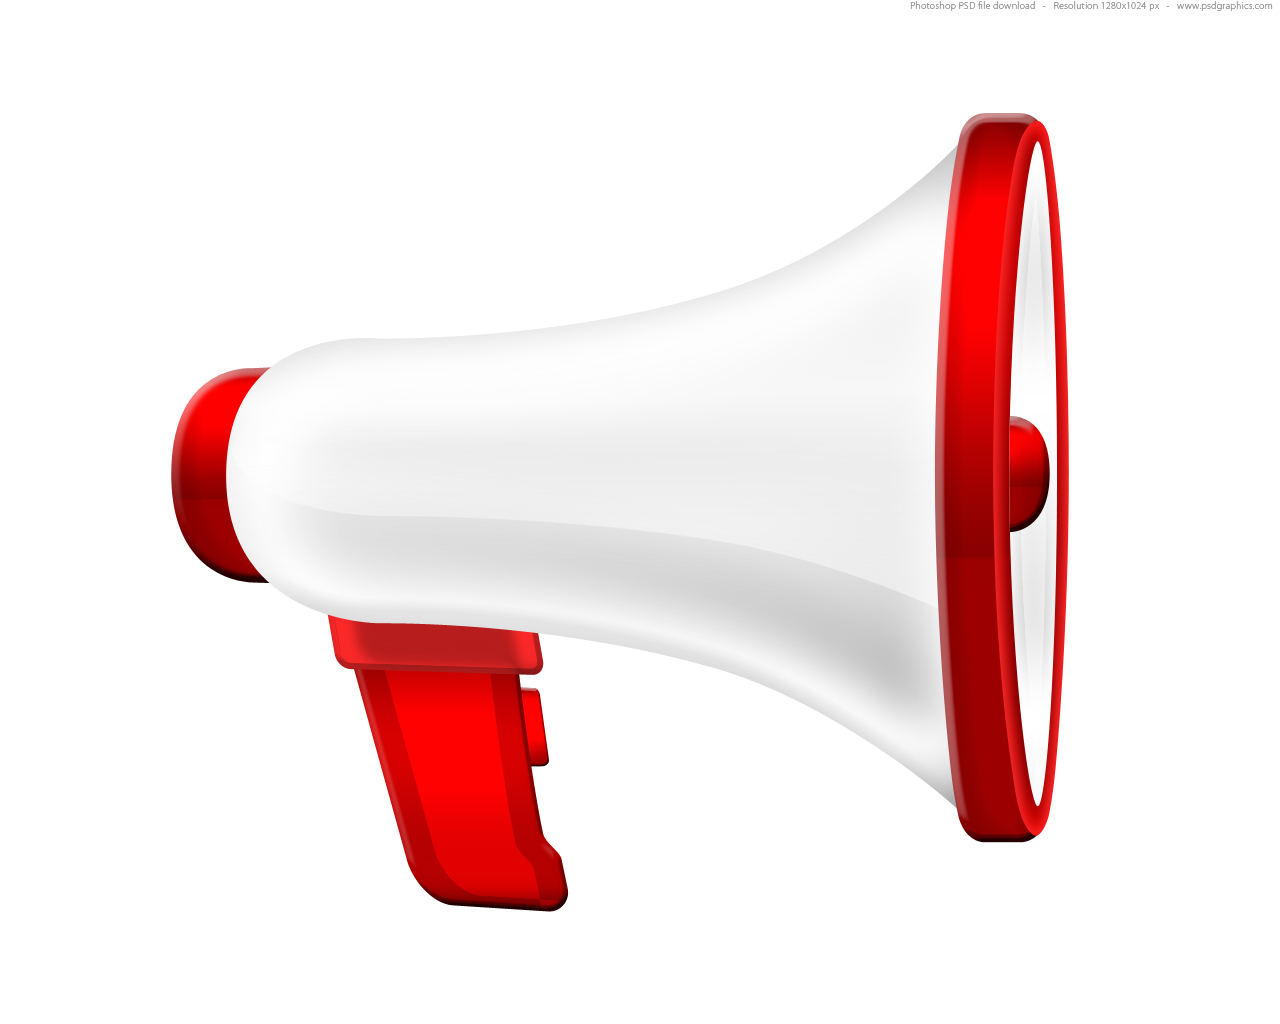 White megaphone icon (PSD) | PSDGraphics